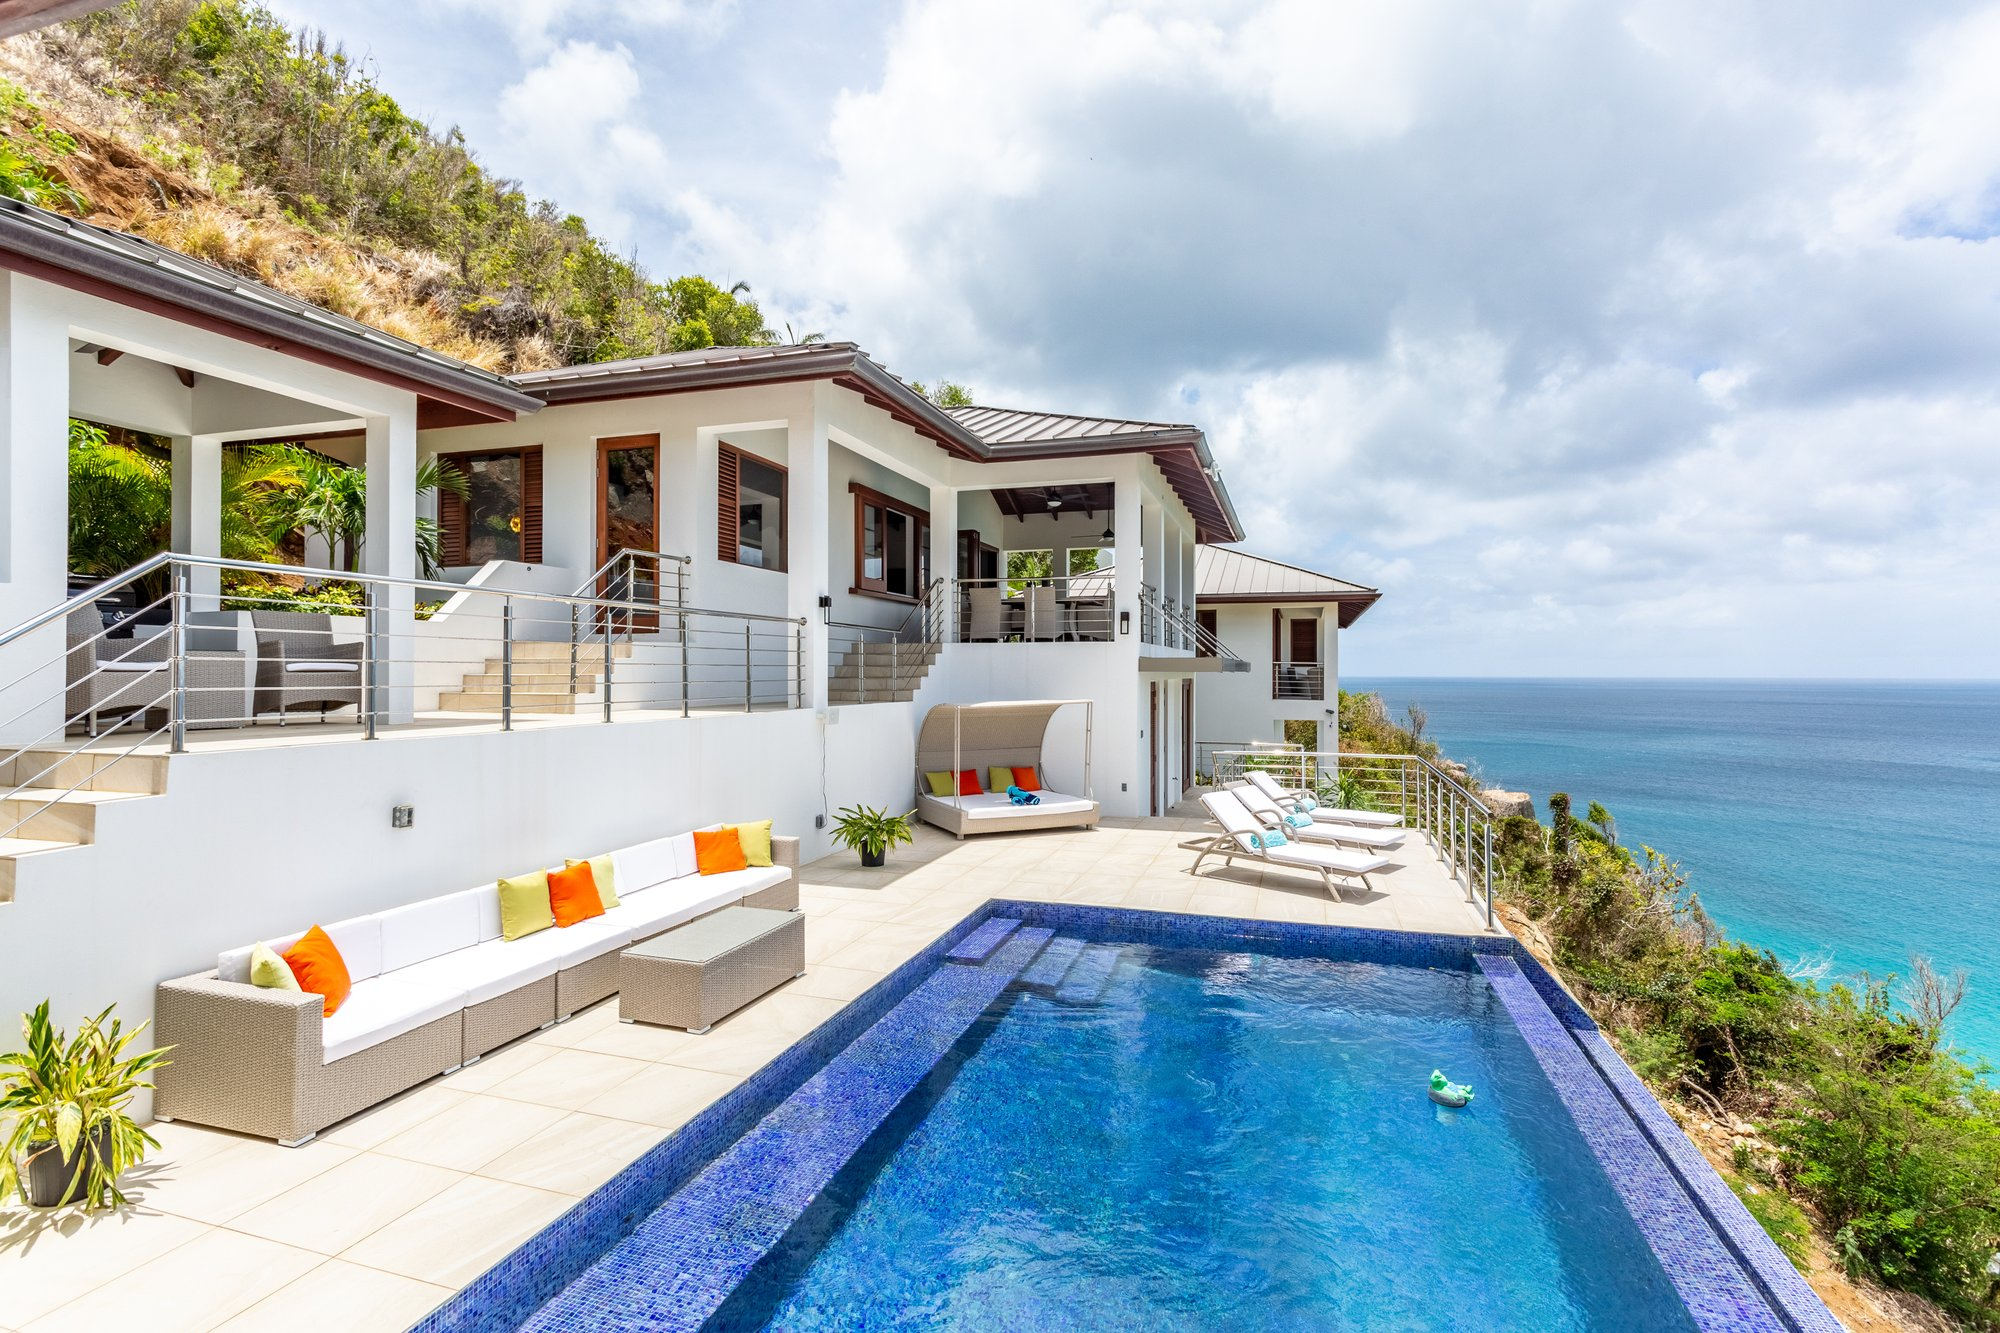 House in Road Town, Tortola, British Virgin Islands 1 - 11620060